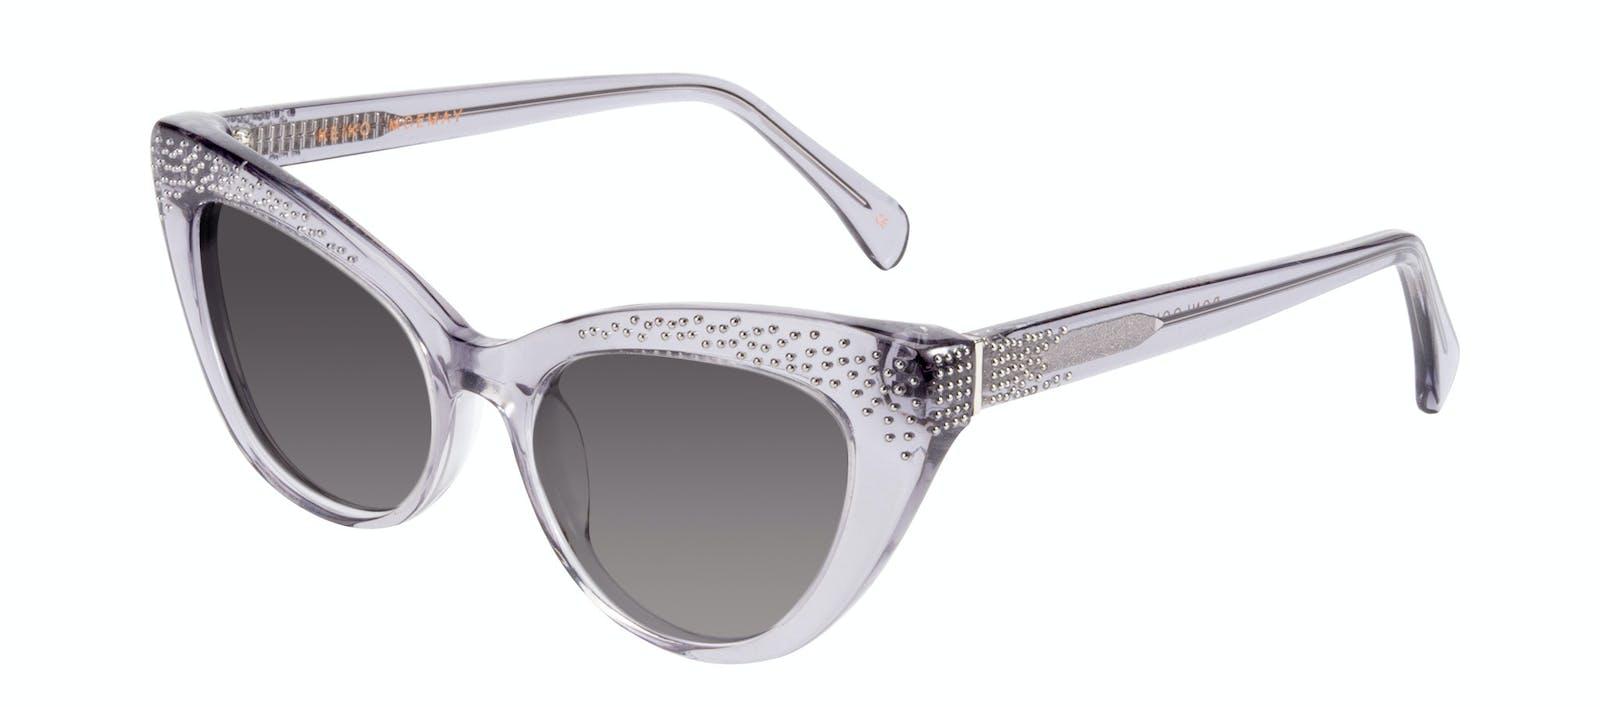 96c371f0bb6 Affordable Fashion Glasses Cat Eye Daring Cateye Sunglasses Women Keiko Moe  May Tilt